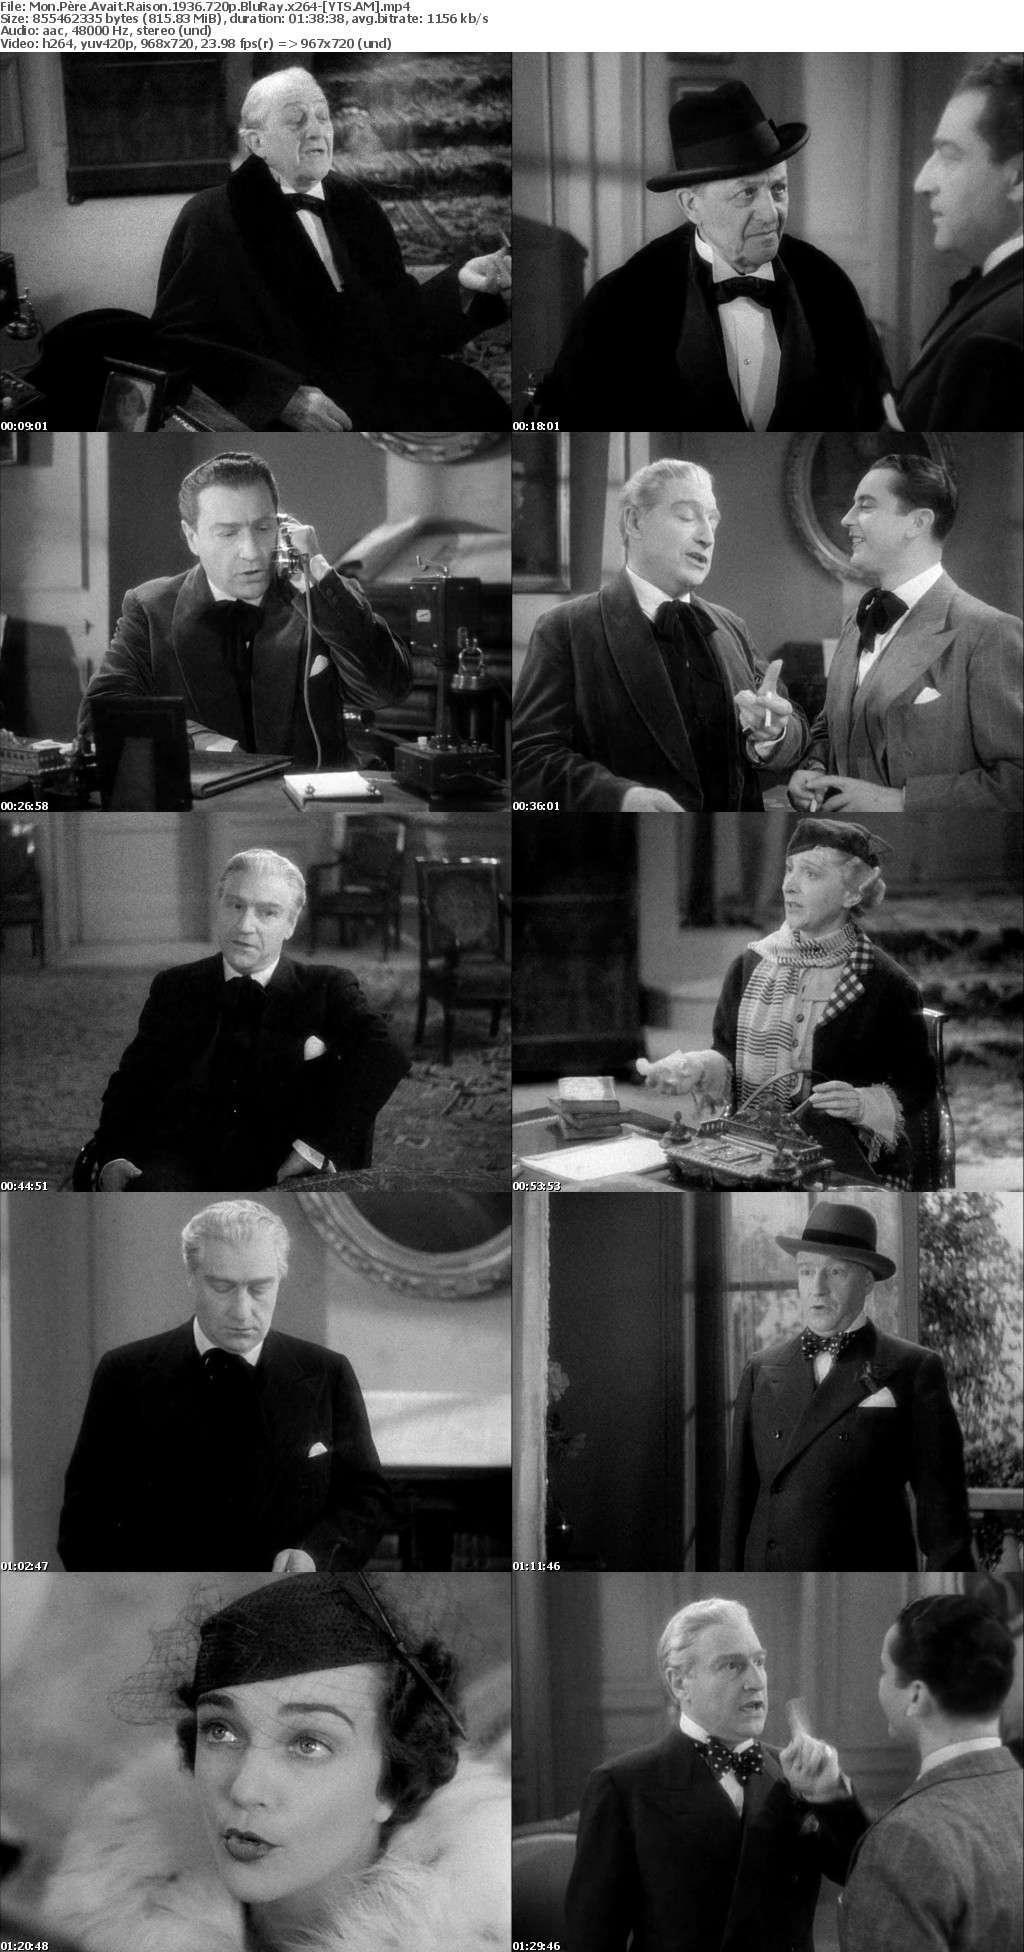 Mon pre avait raison (1936) [BluRay] [720p] YIFY